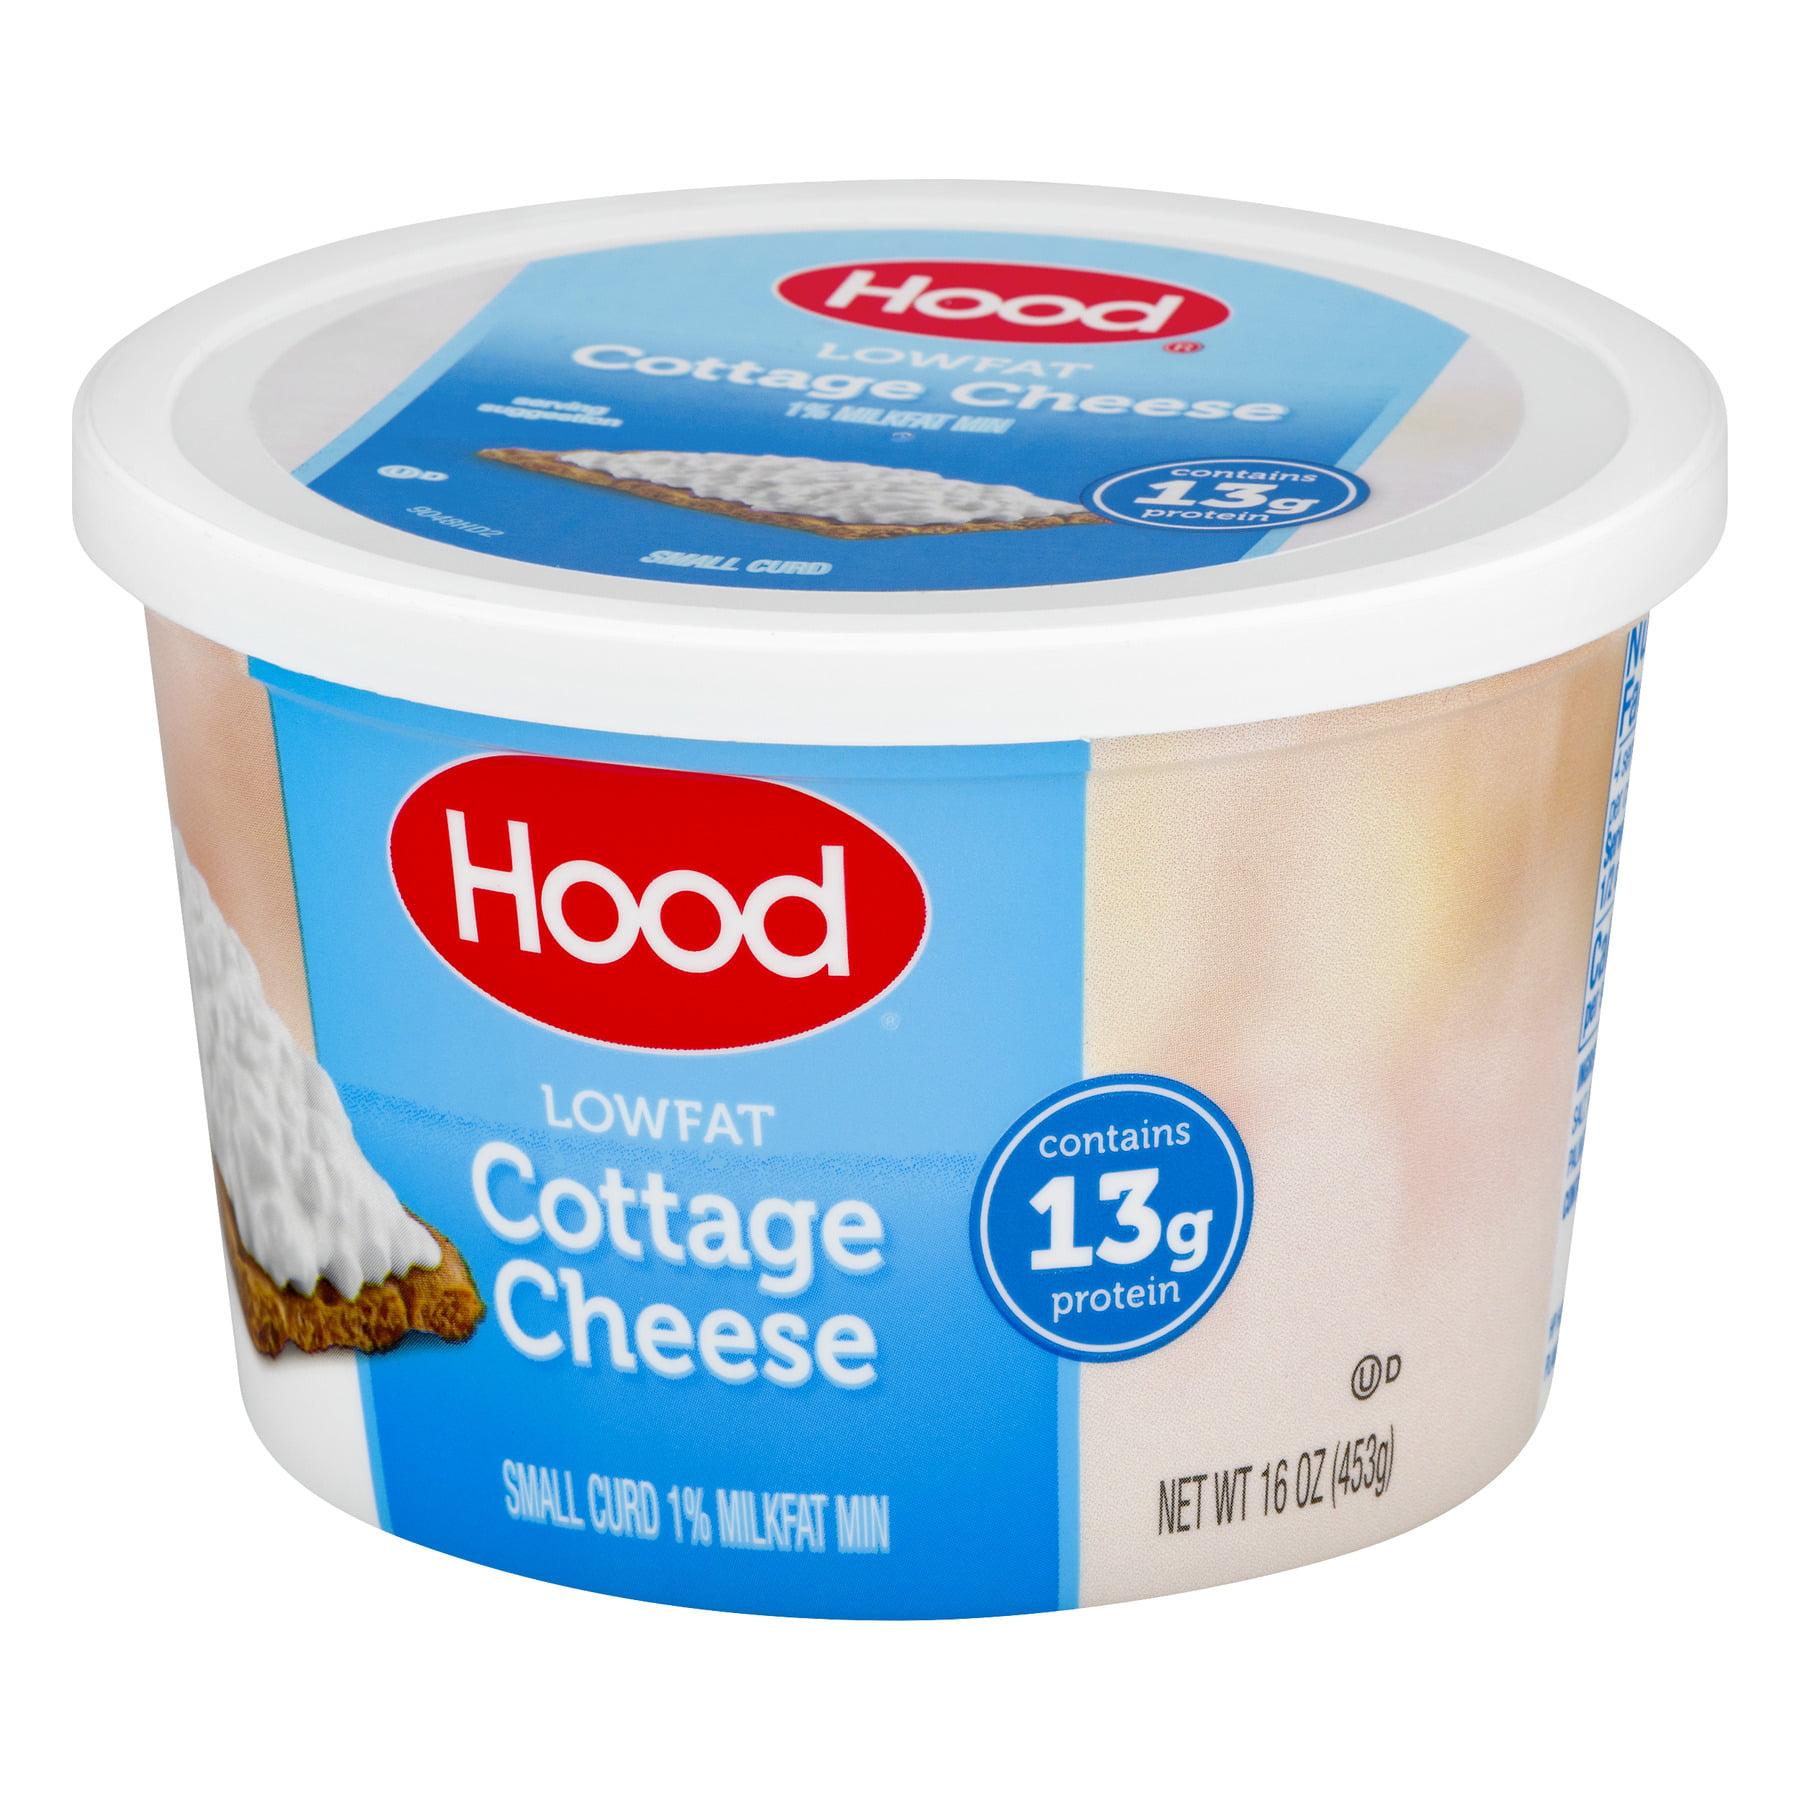 hood small curd 1 milkfat cottage cheese 16 oz walmart com